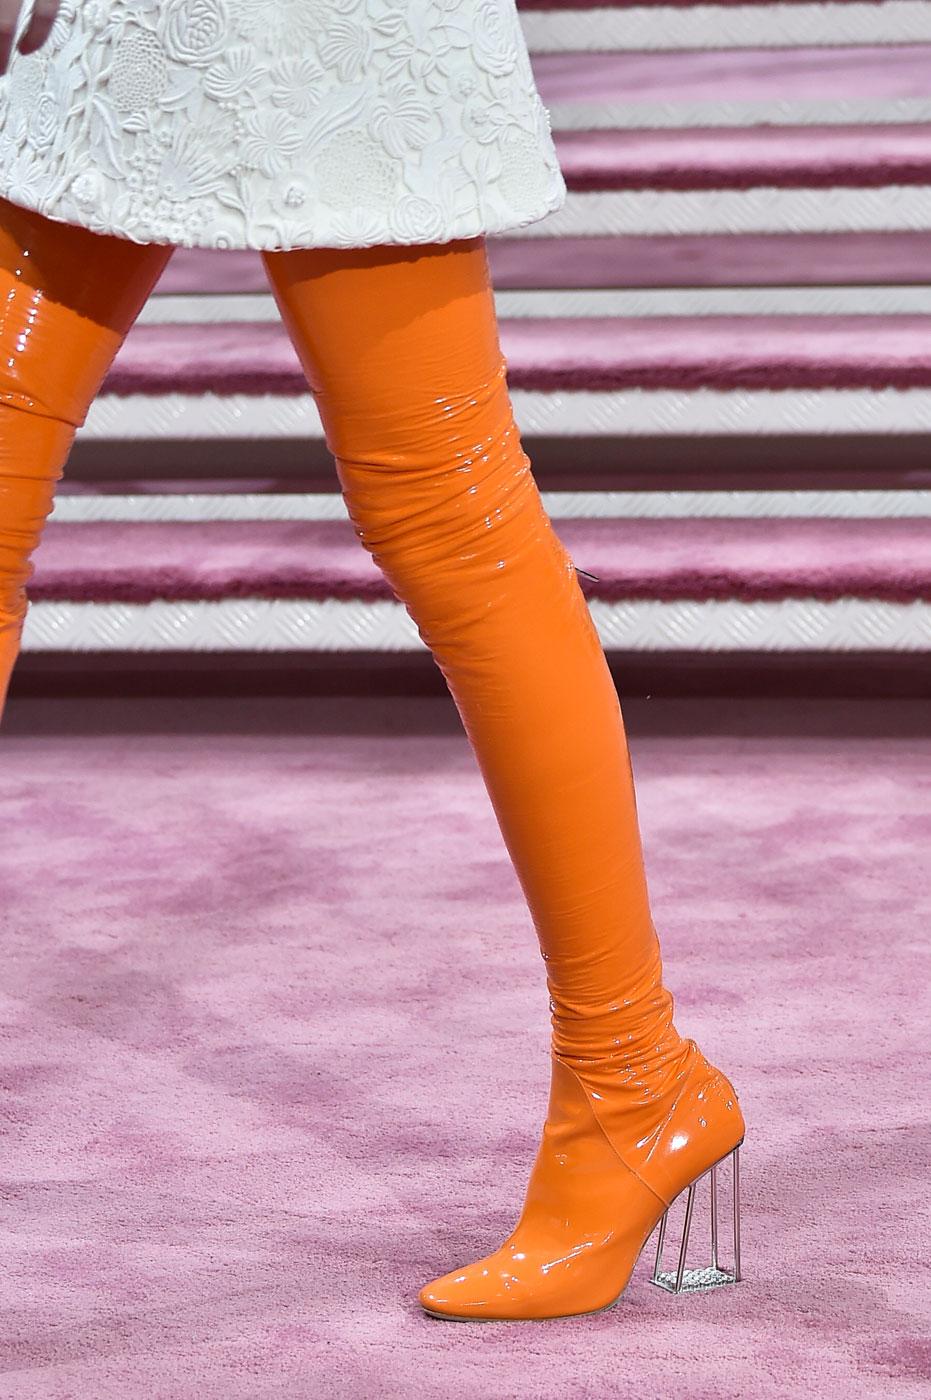 Christian-Dior-fashion-runway-show-close-ups-haute-couture-paris-spring-summer-2015-the-impression-173